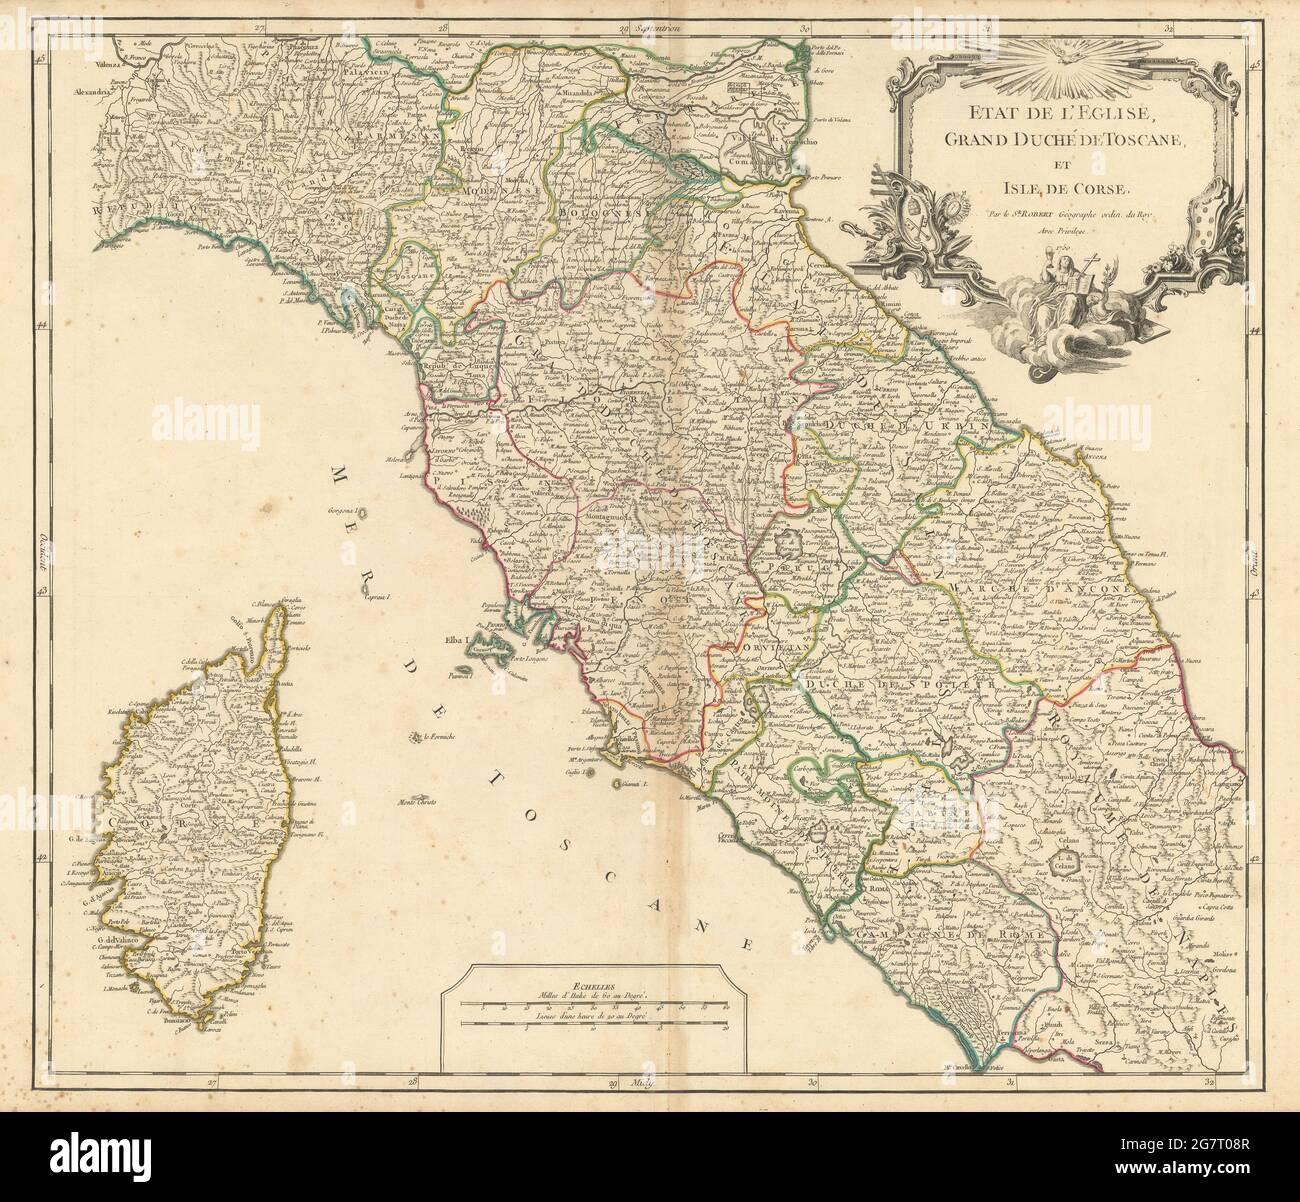 """Etat l'Eglise, Grand Duché Toscane et Isle Corse"" Tuscany. VAUGONDY 1750 map Stock Photo"